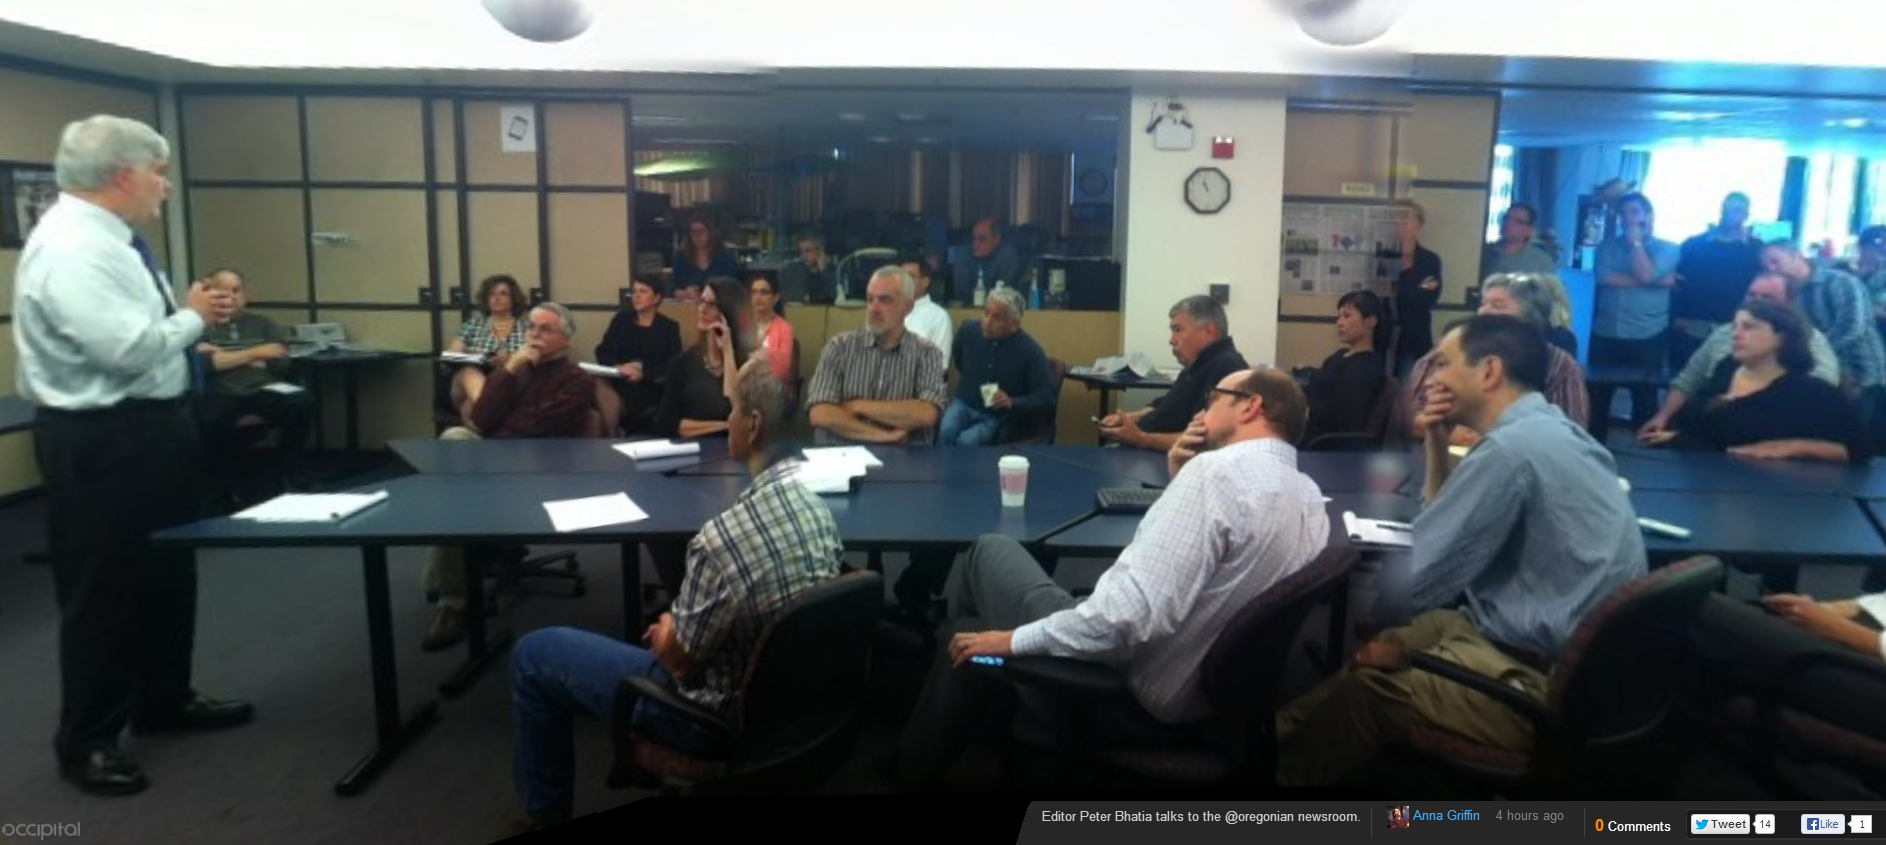 Oregonian newsroom June 20, 2013